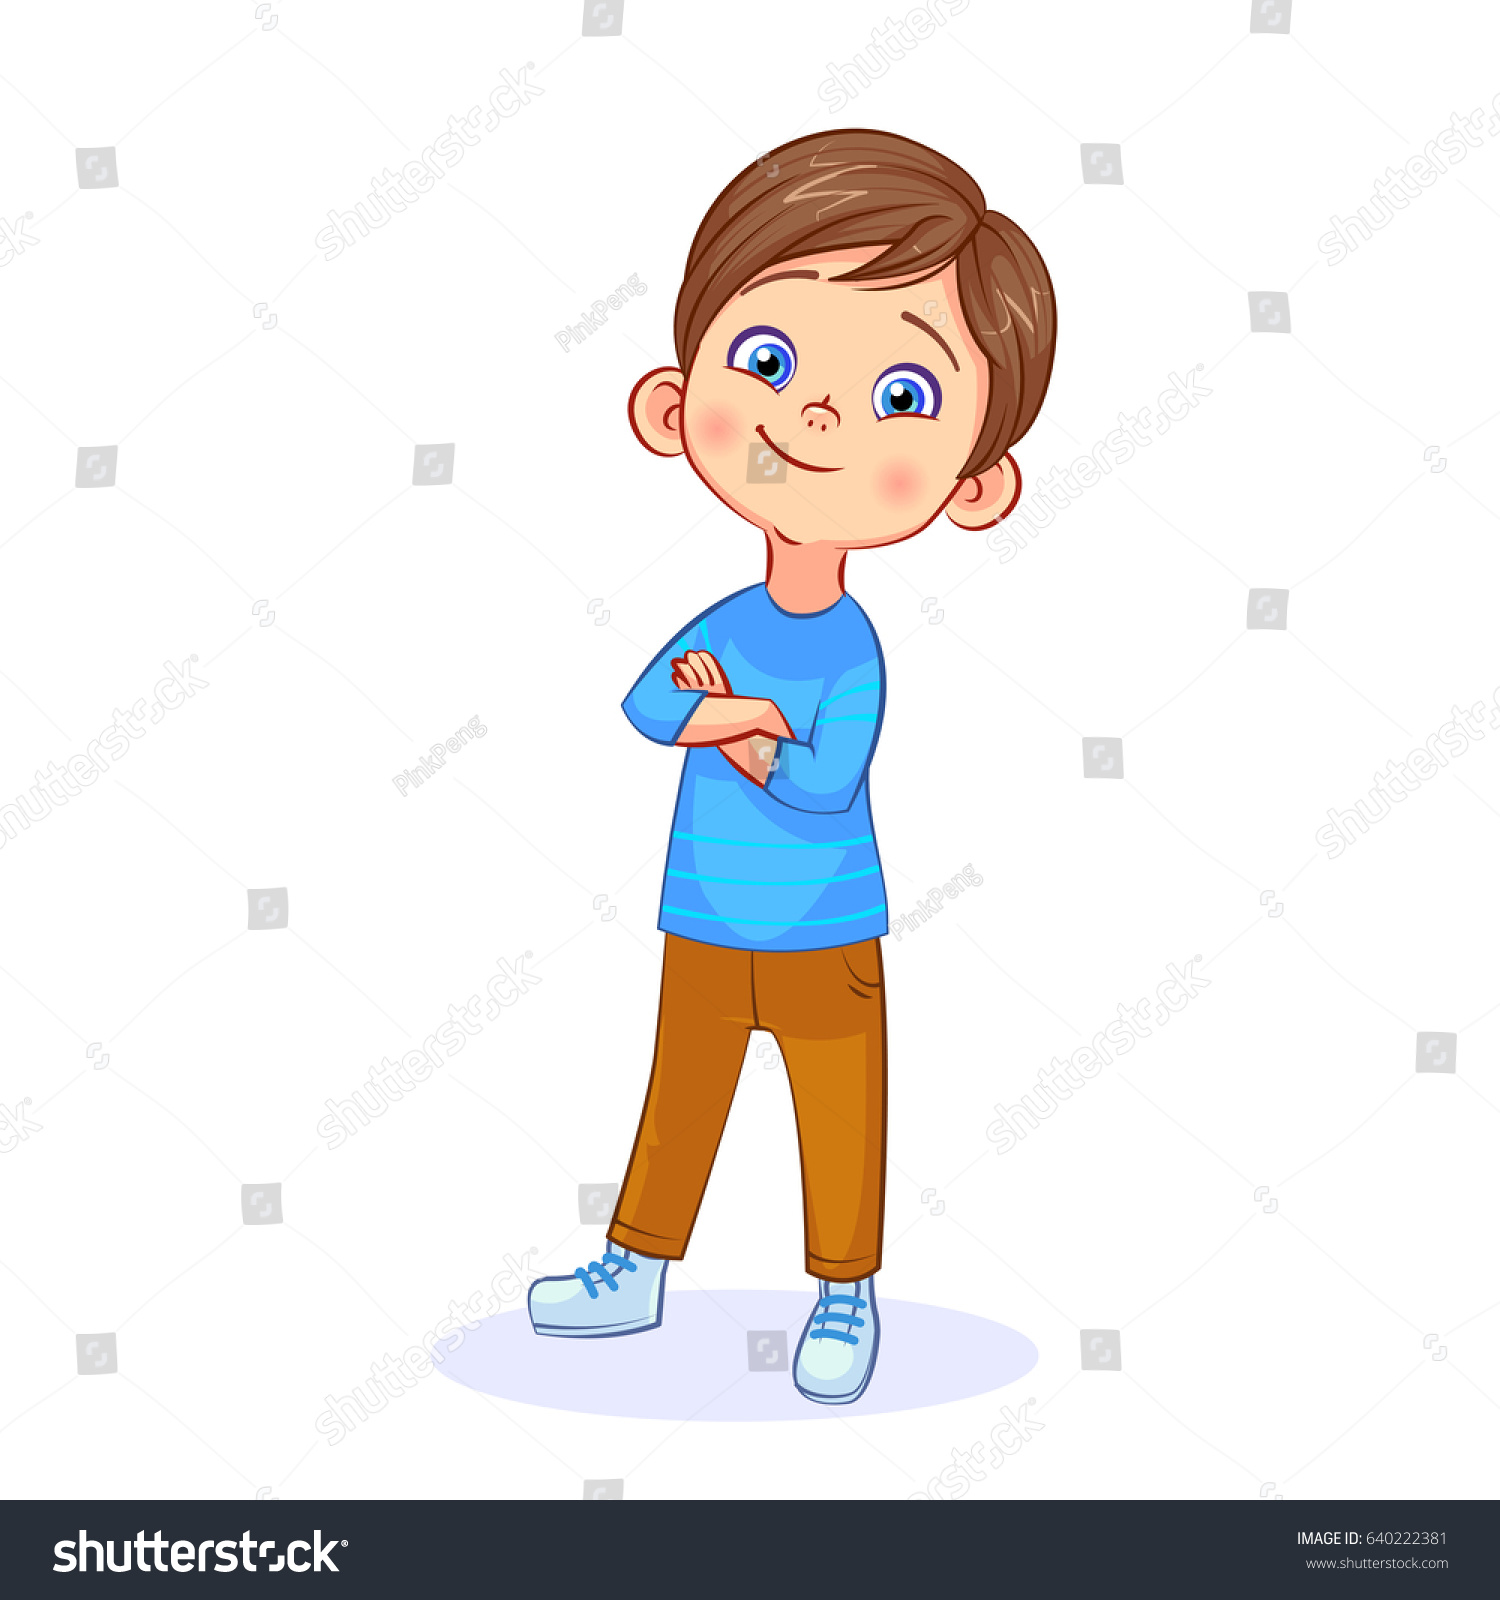 Cartoon Image Cute Boy Cartoon Images